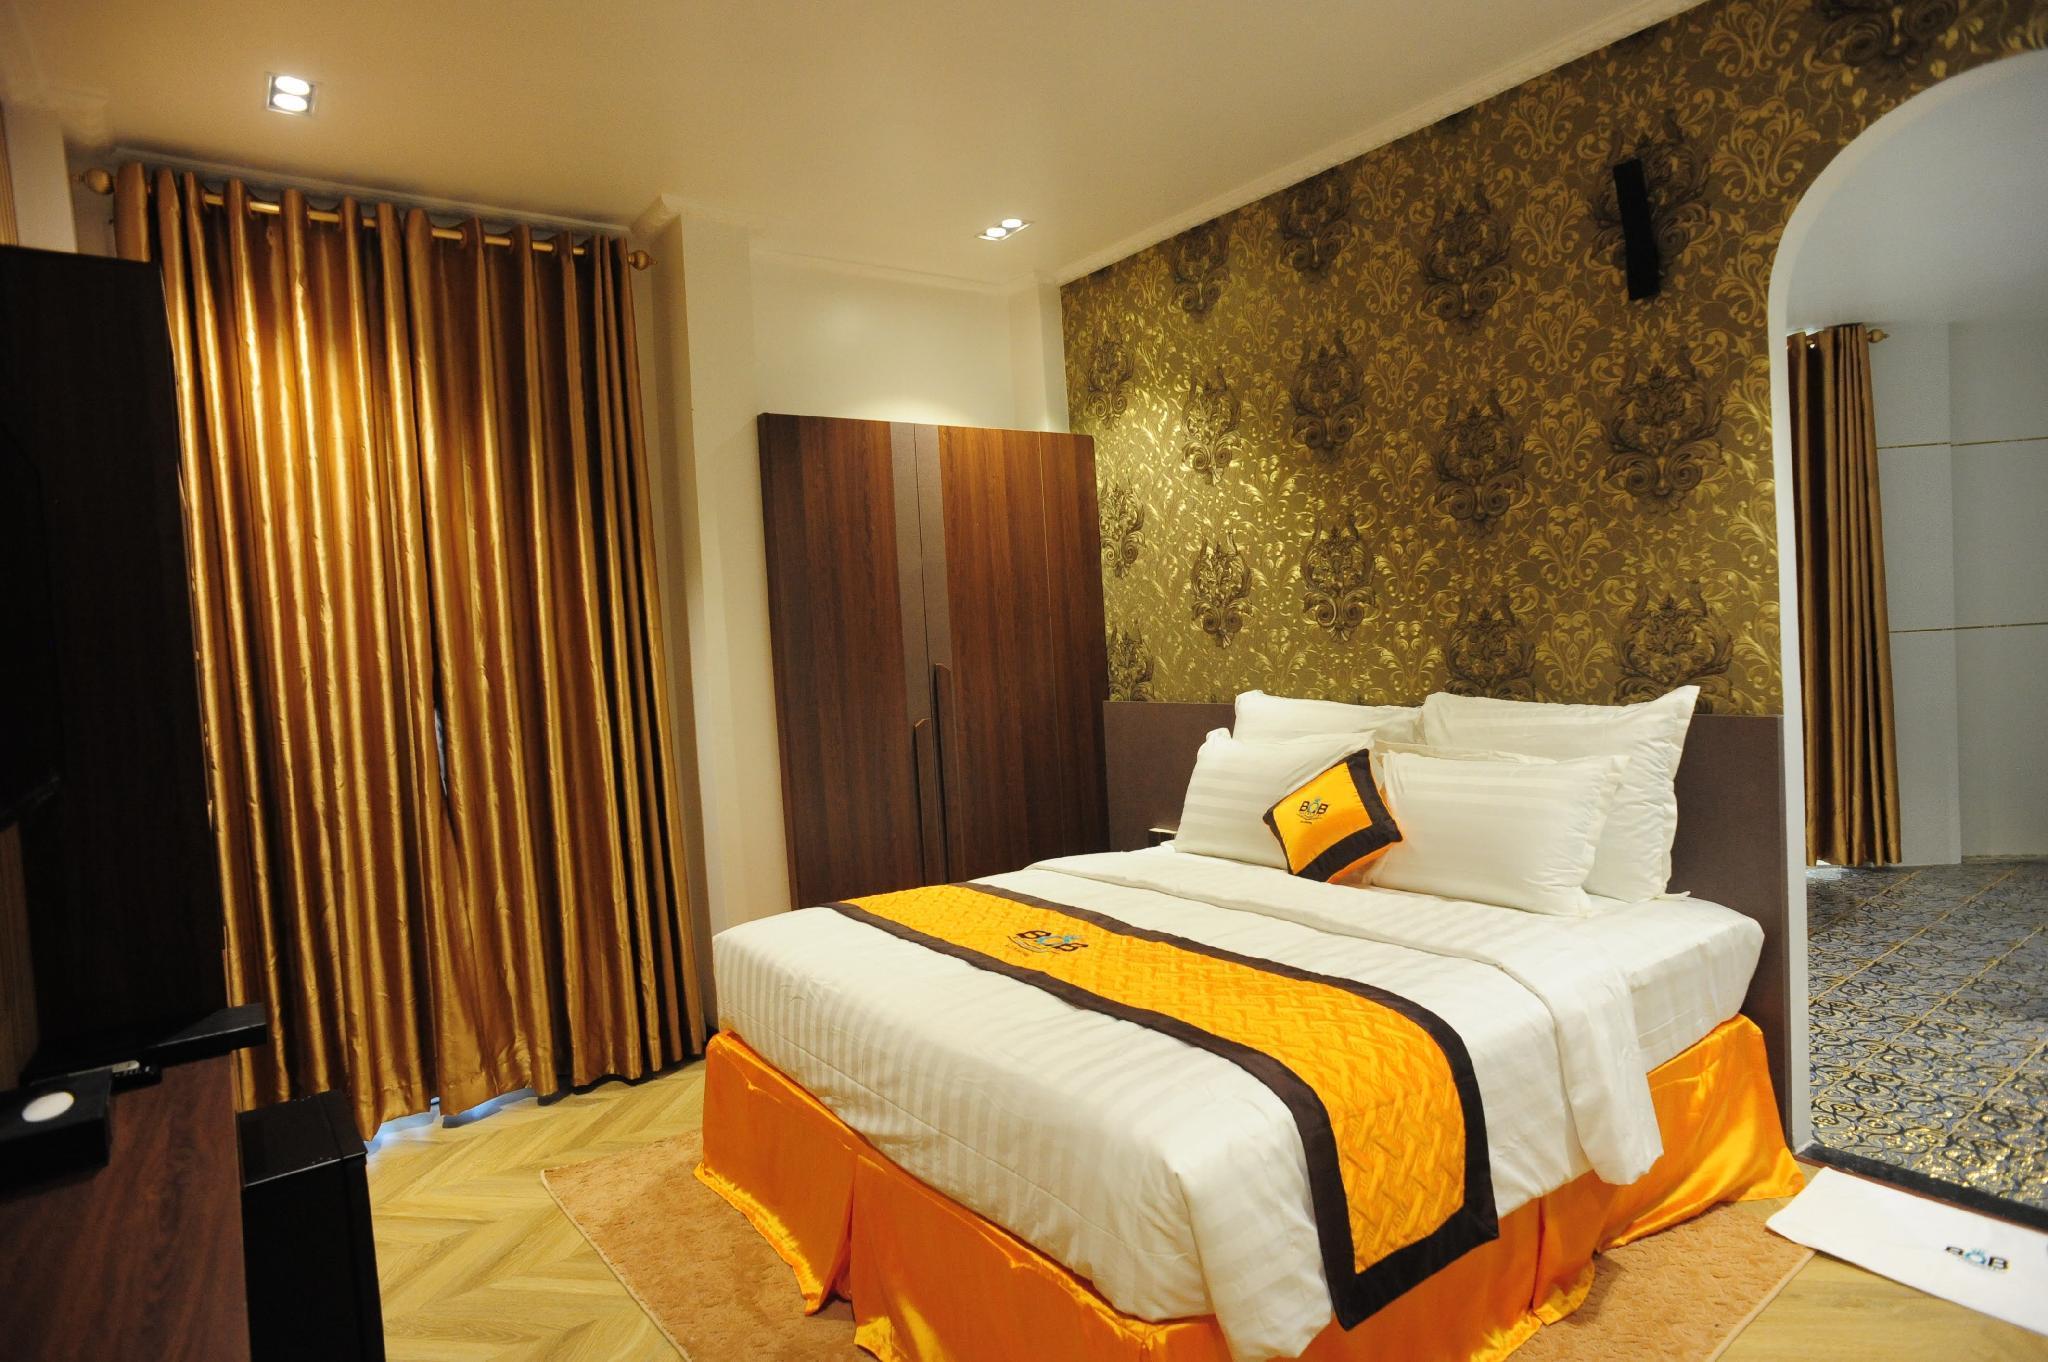 B.O.B HOTEL, Cao Lanh